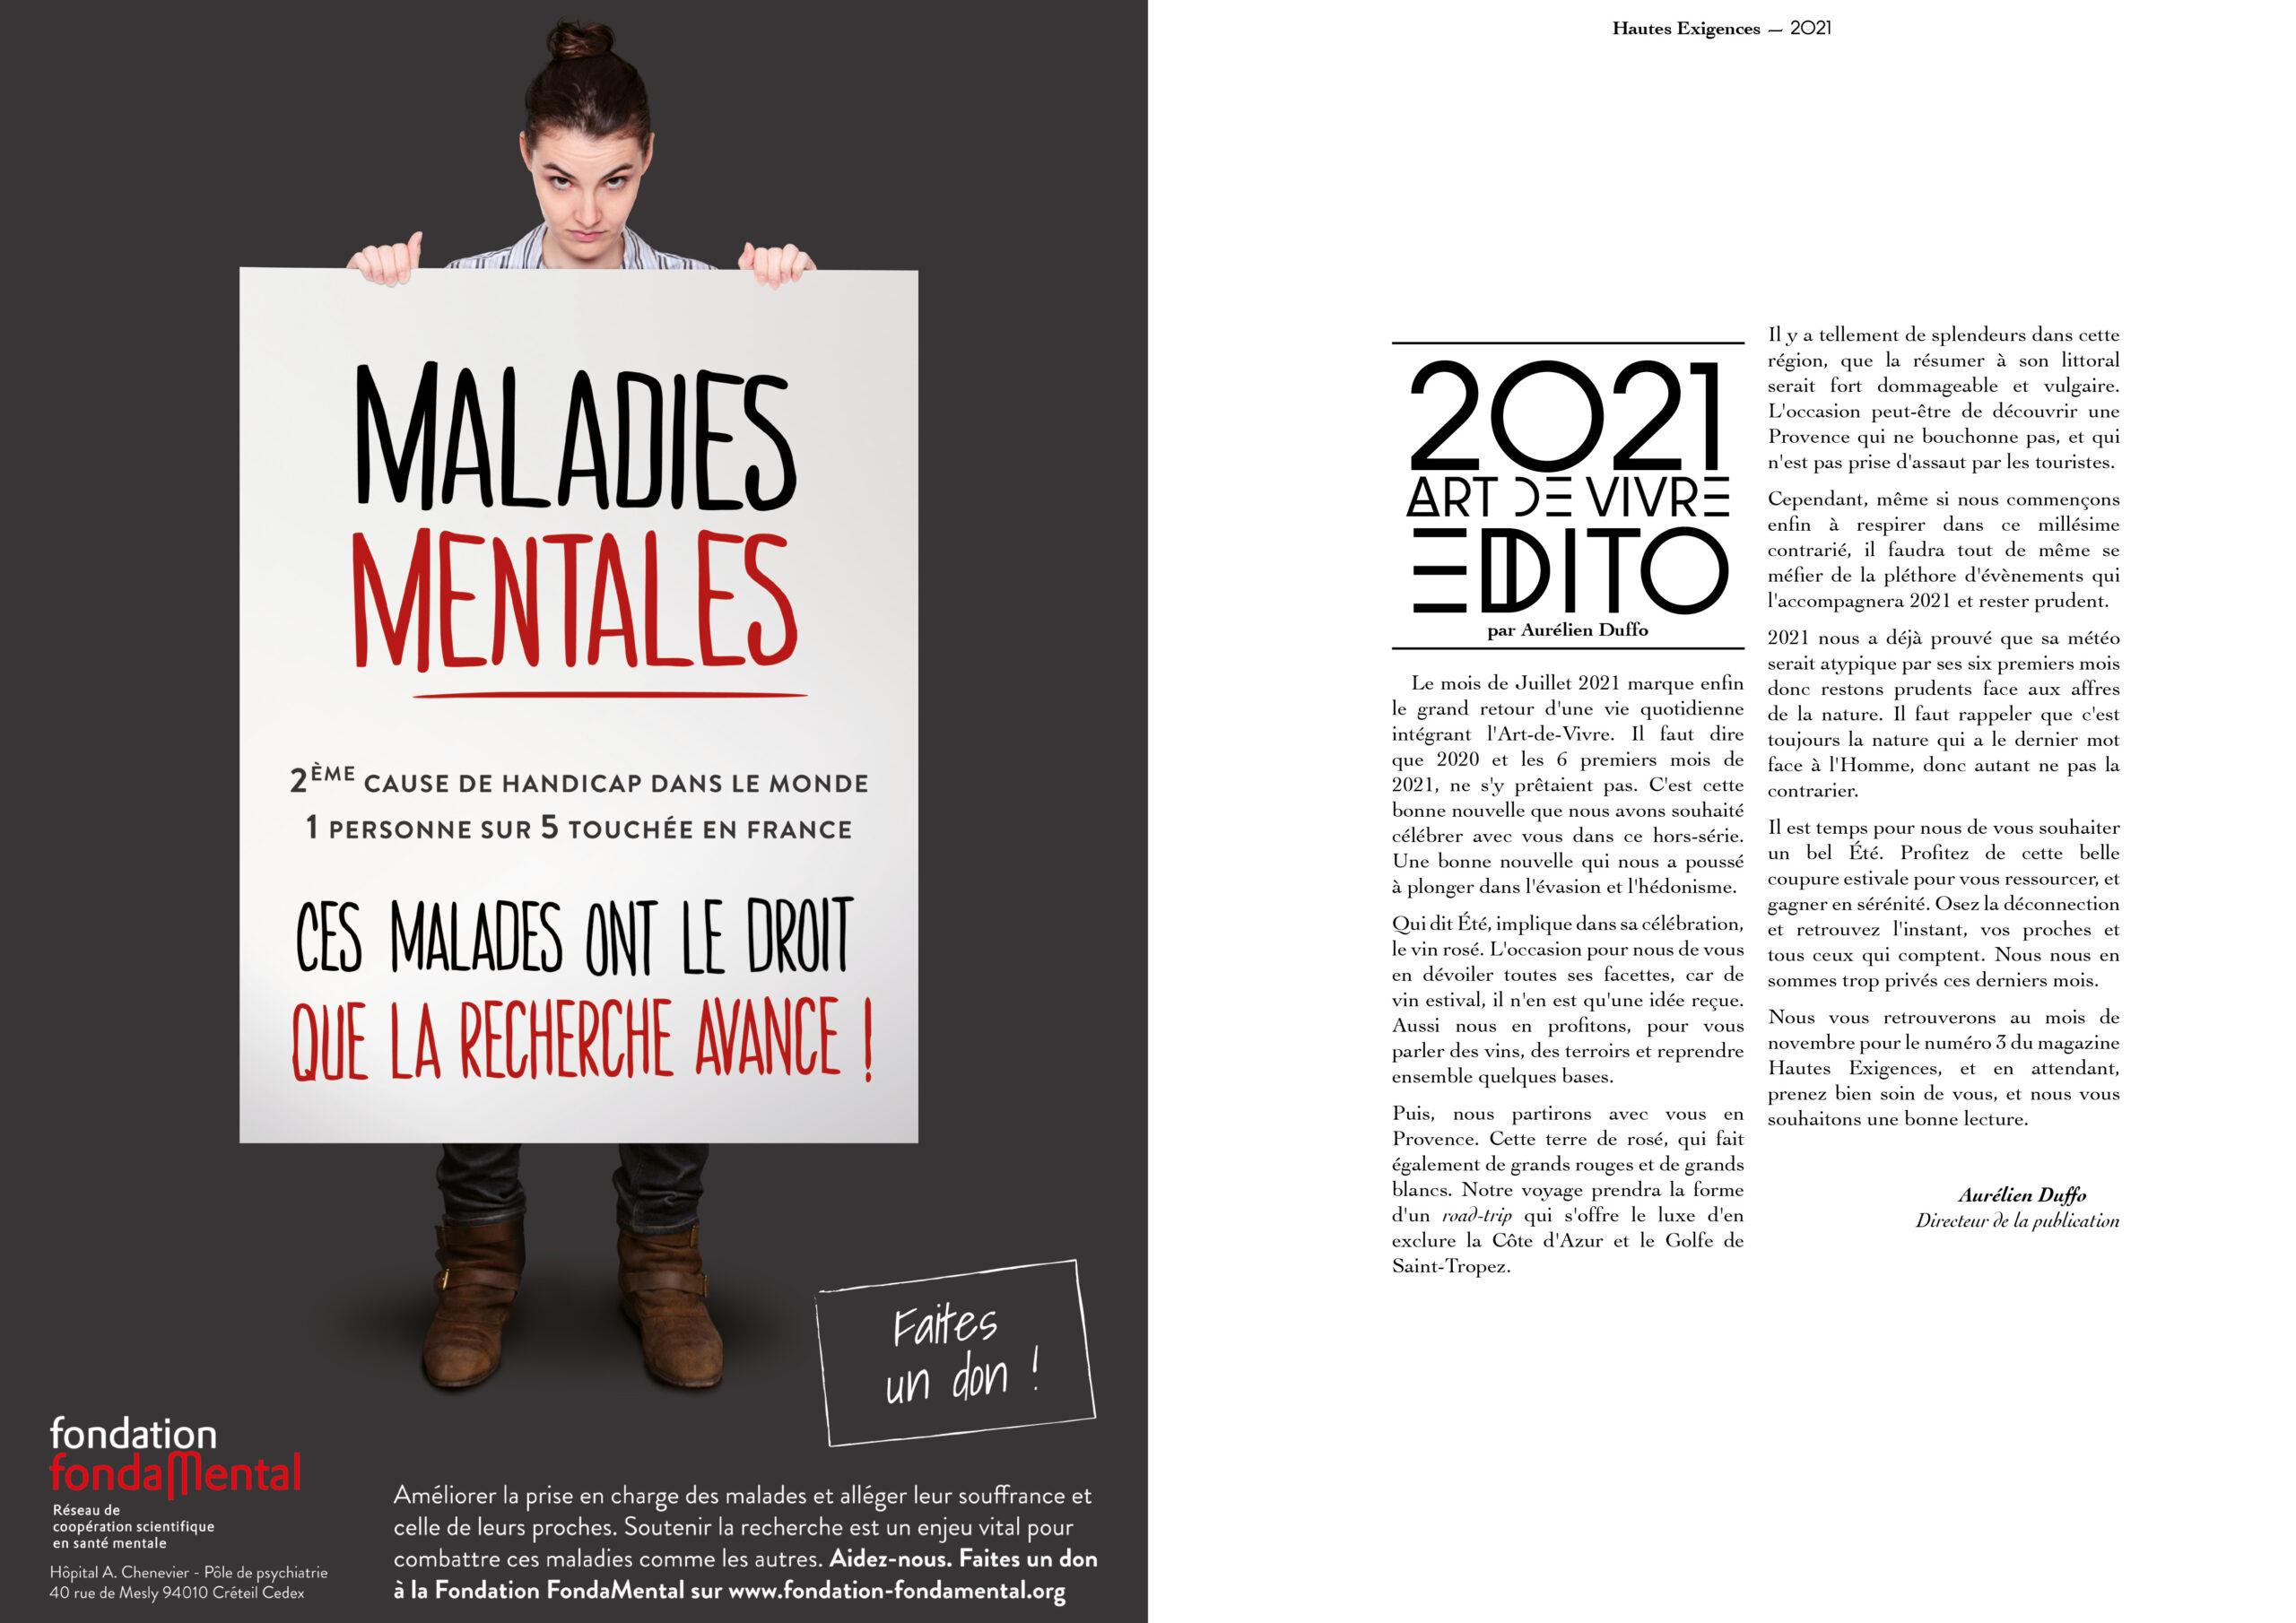 Hautes Exigences Magazine Hors Serie 2021 page 6-7